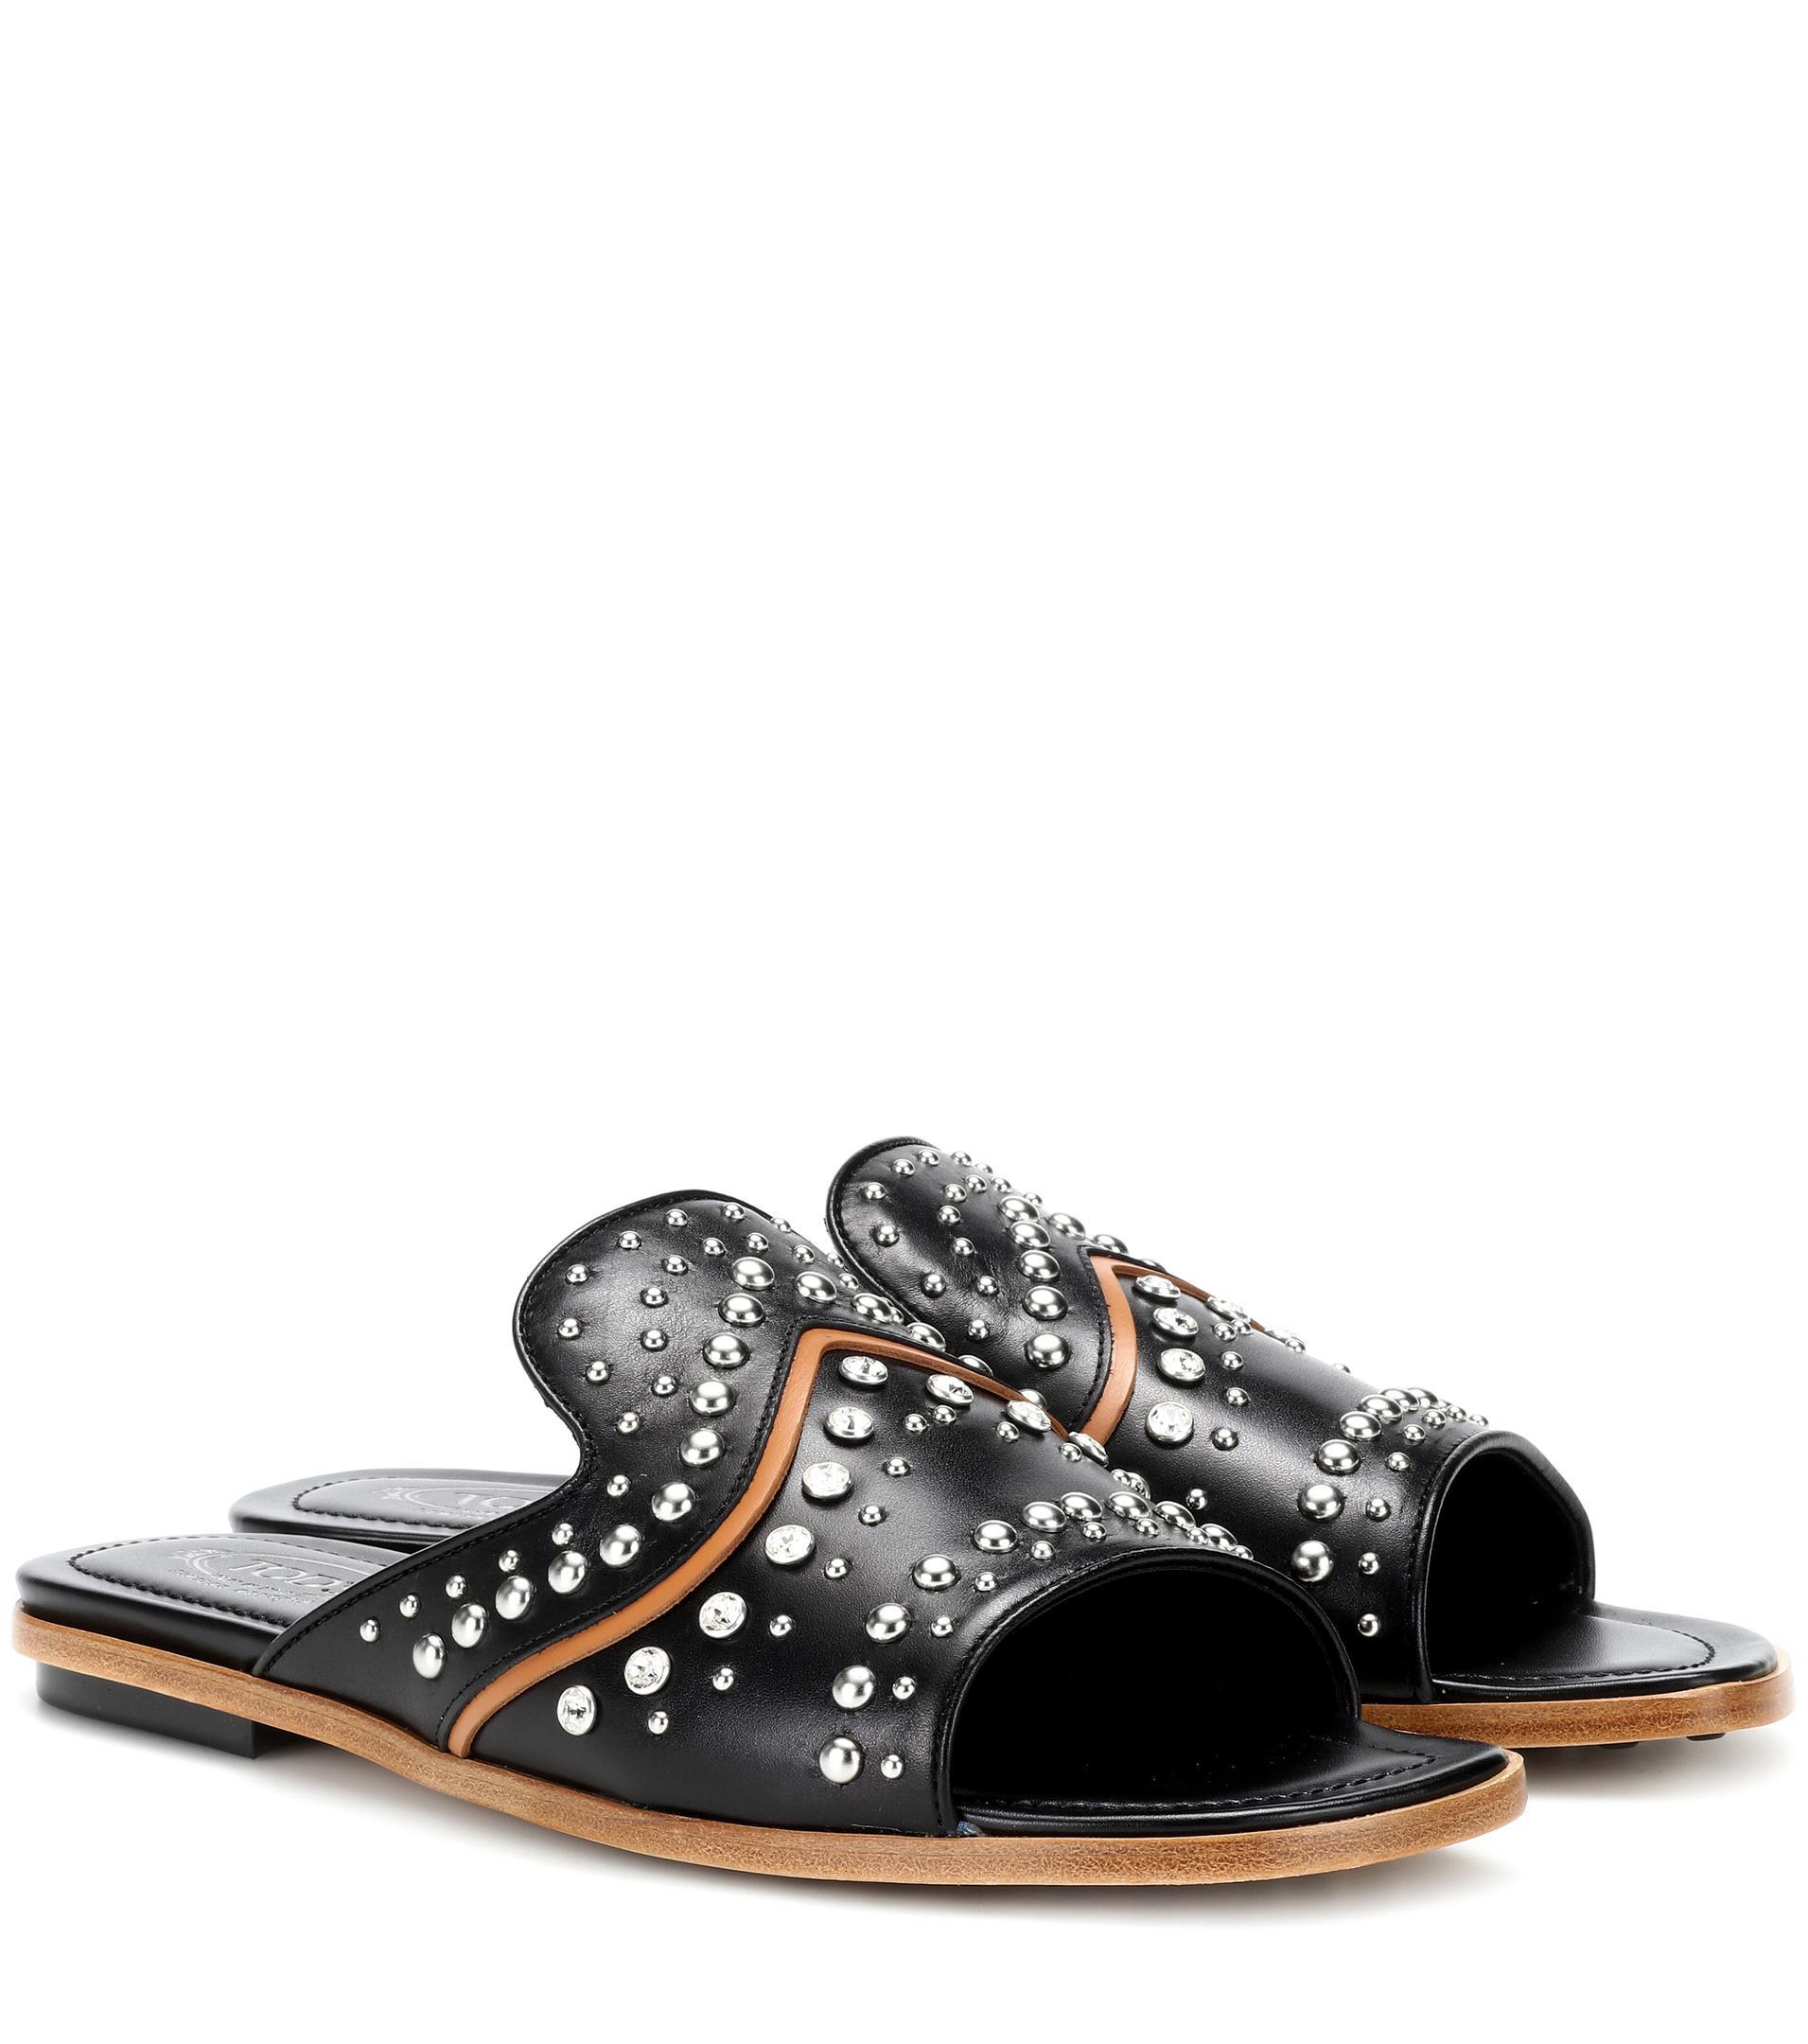 Embellished leather sandals Tod's ir7vn21